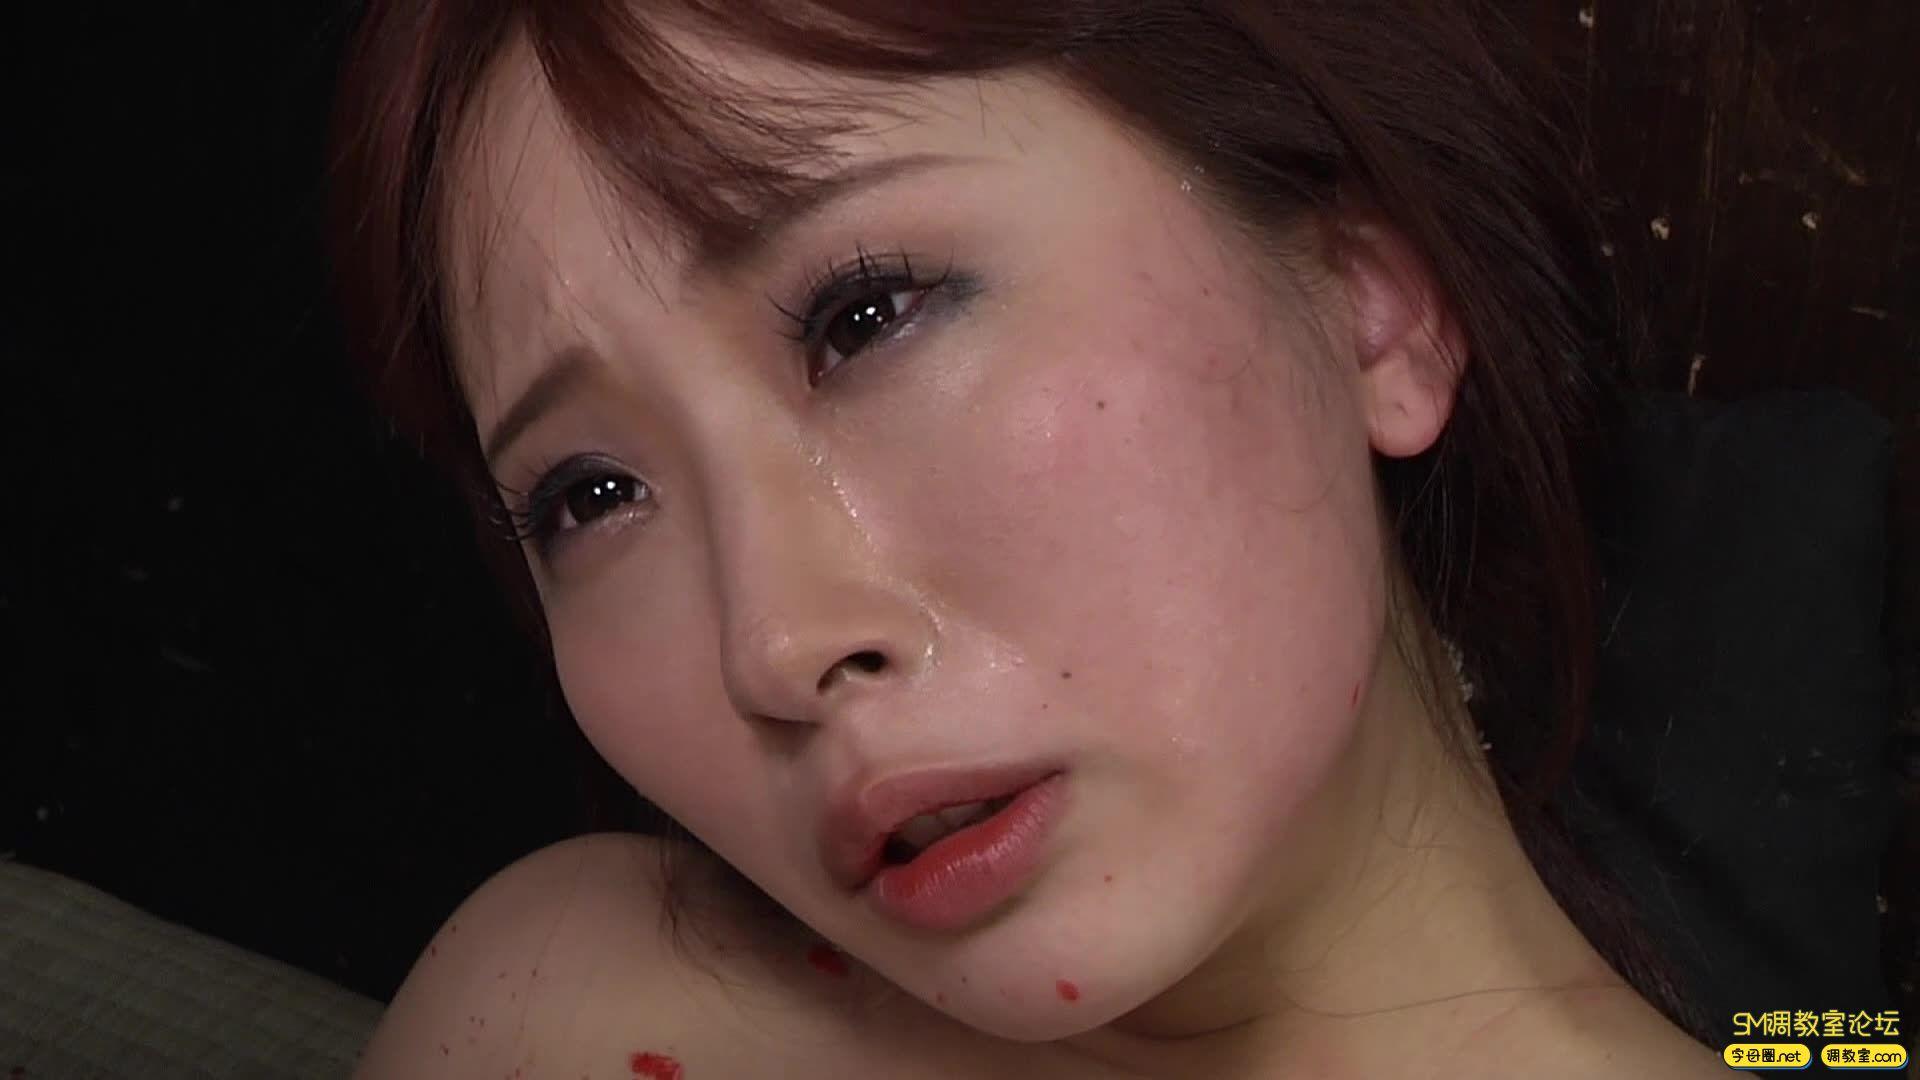 [Dogma合集] - GTJ-030 - 縄・女囚拷問 美咲結衣-视频截图6